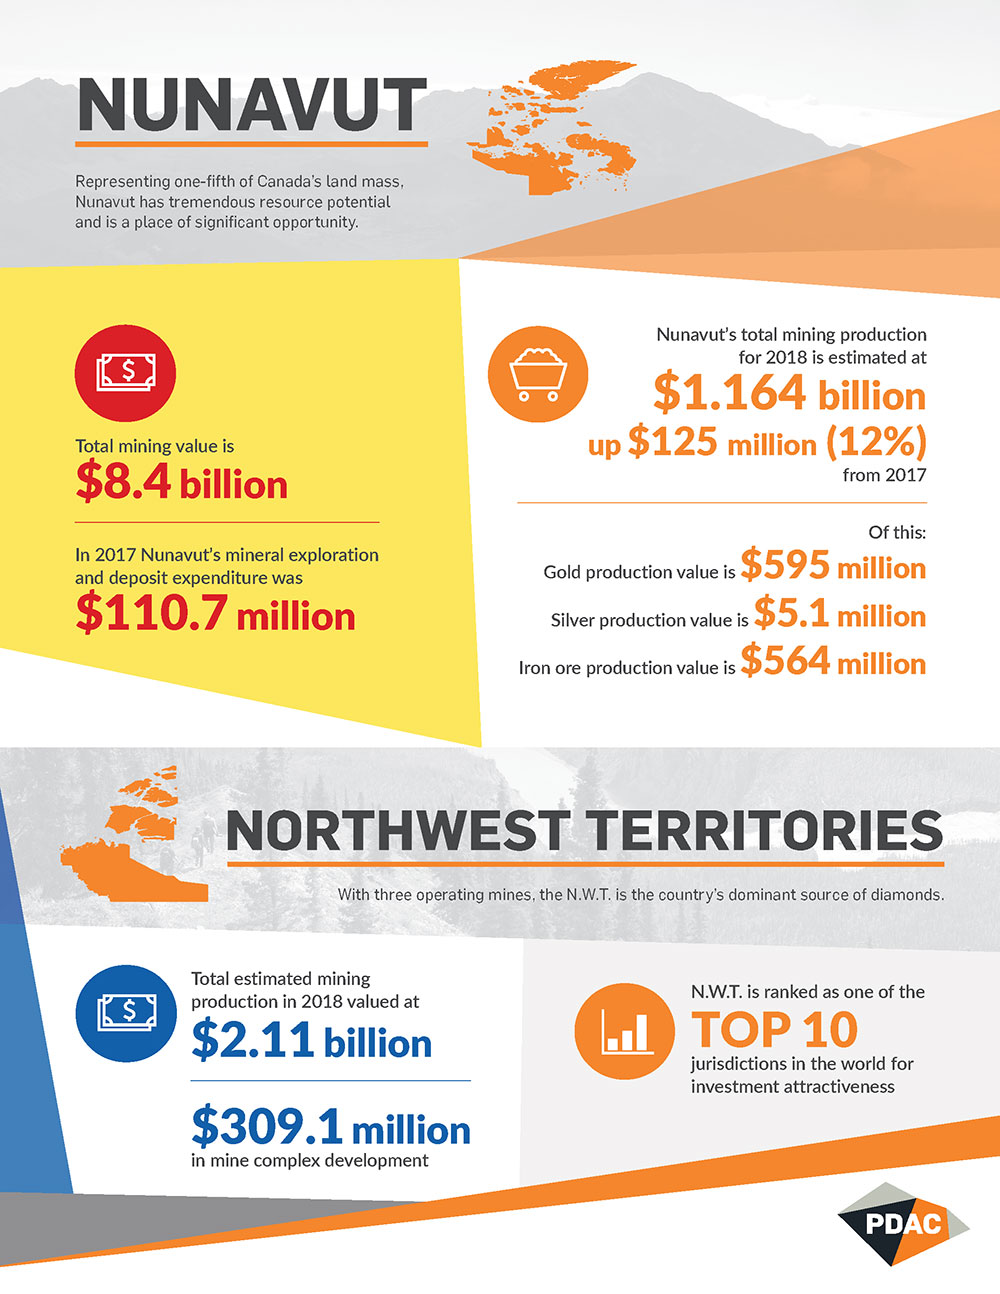 PDAC-NWT-Nunavut